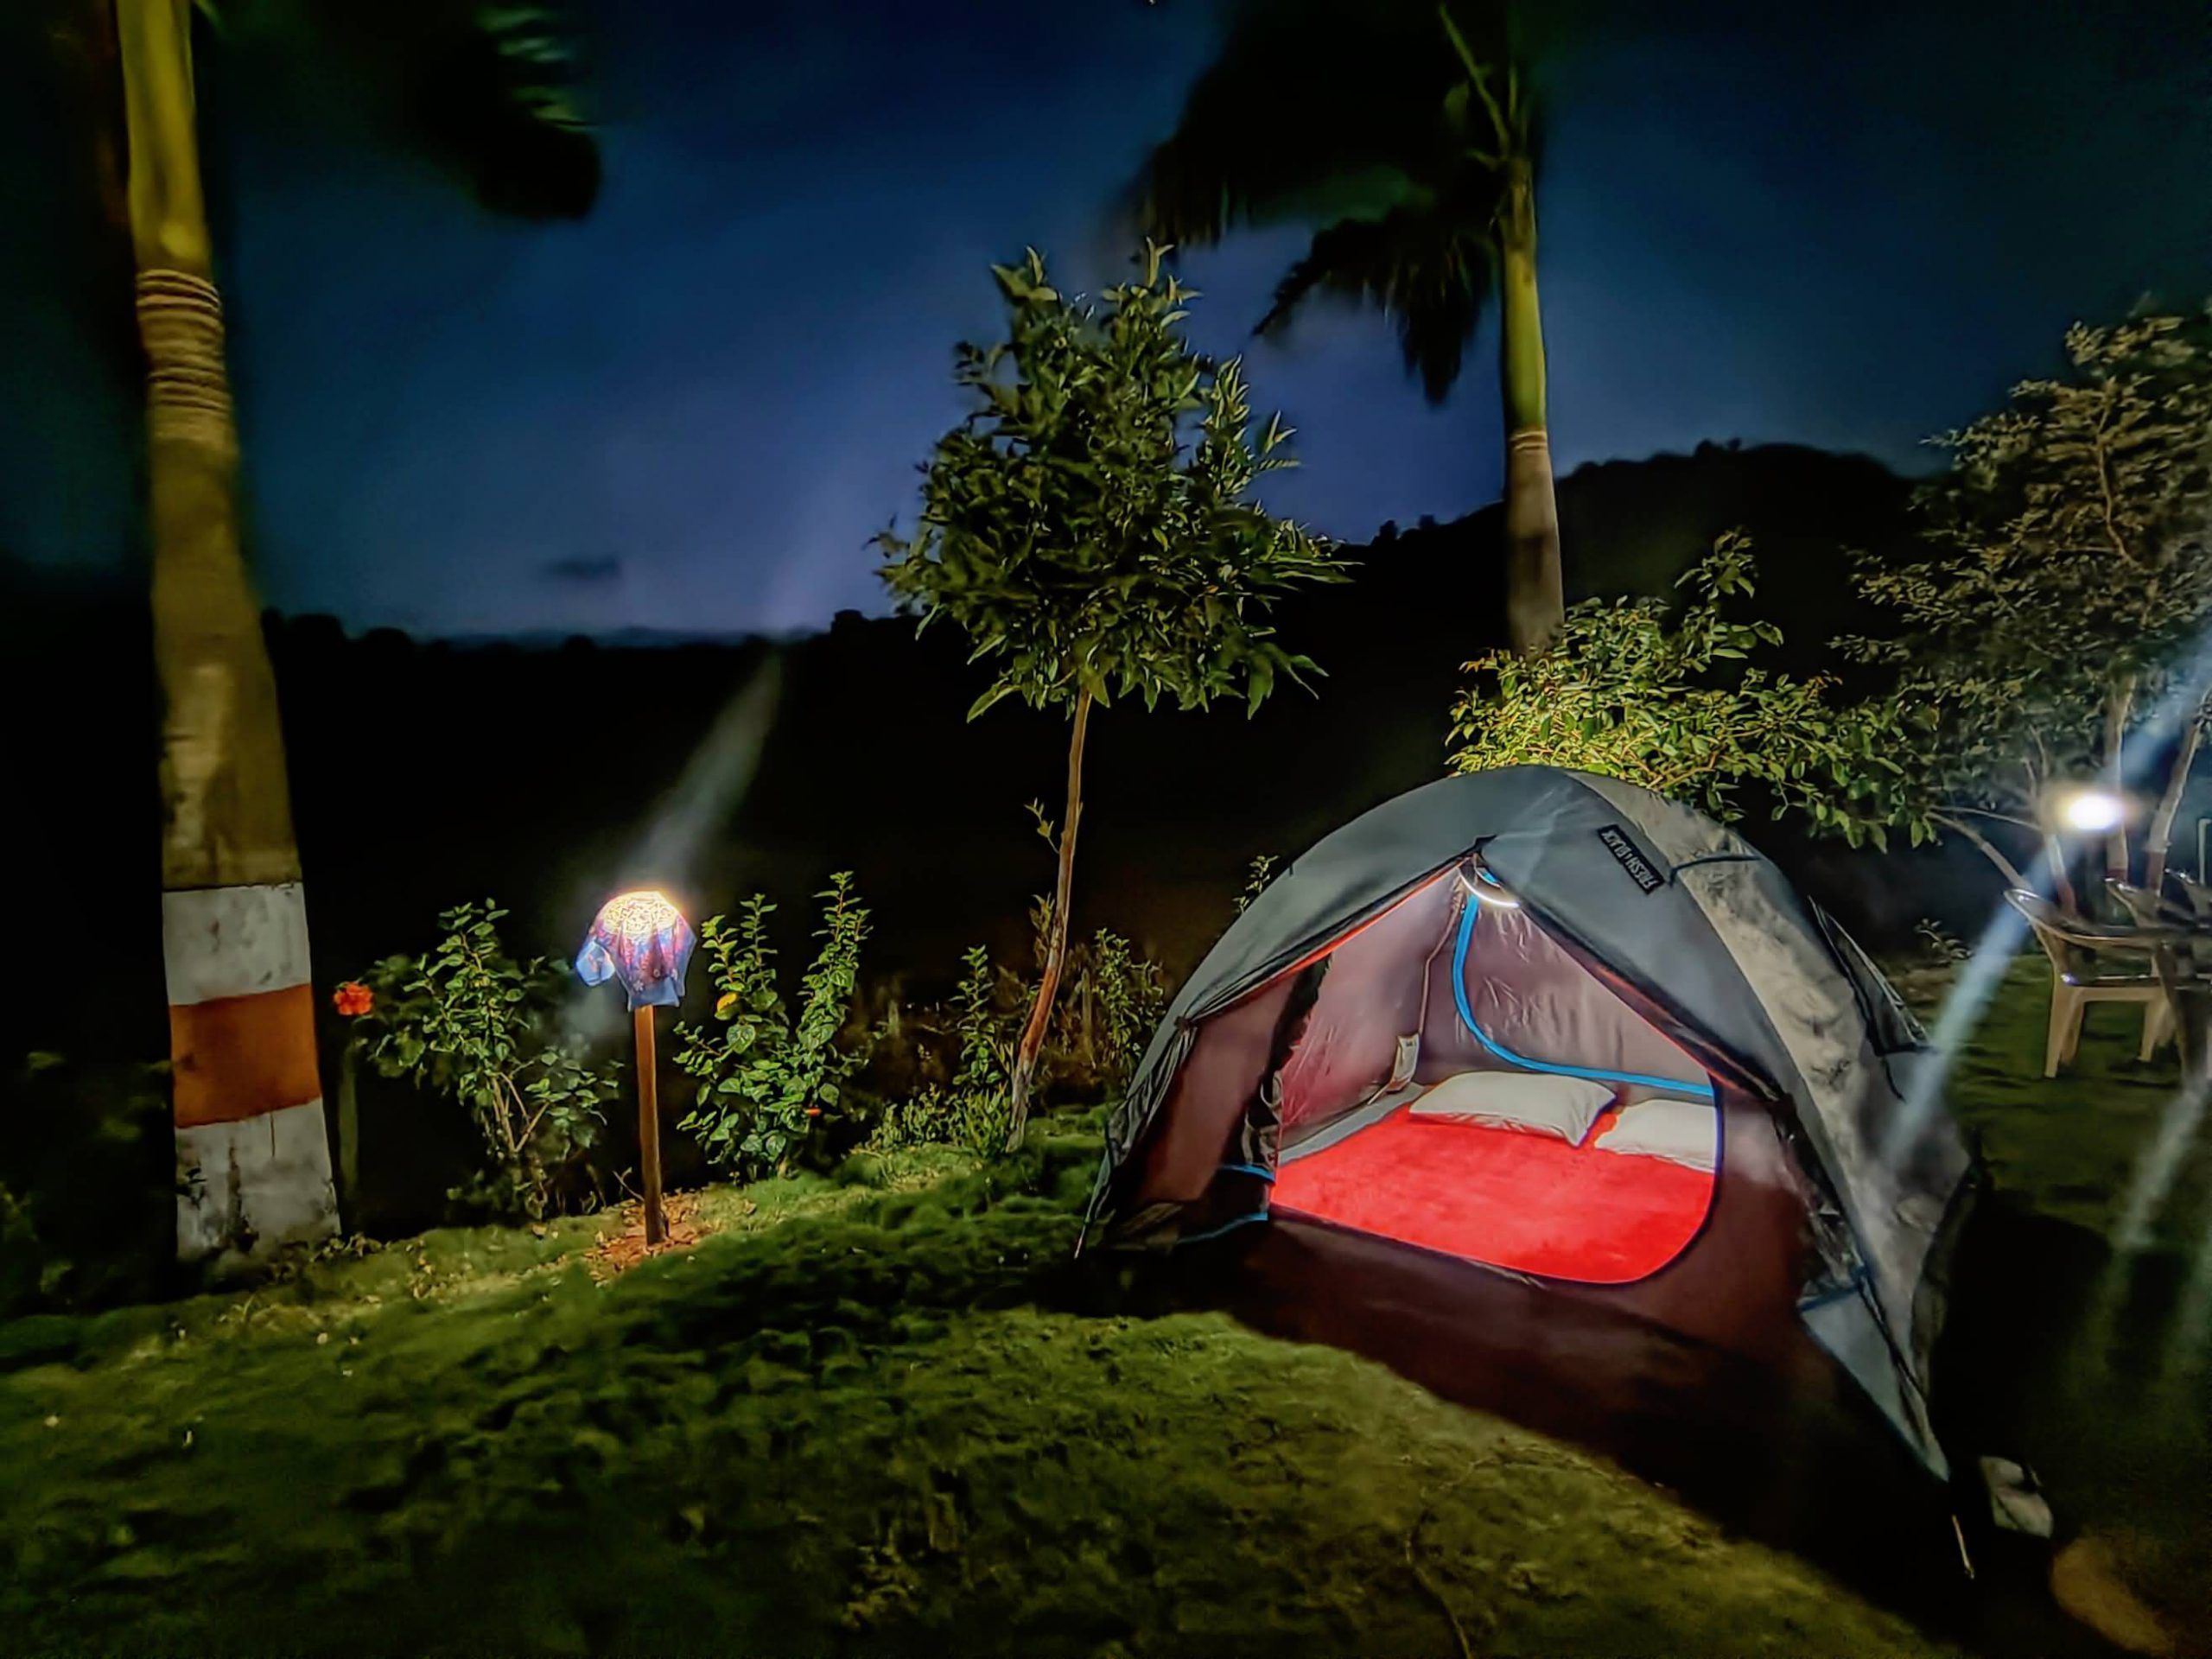 Tent camping at night in HAVE Villas JMD Farm in Pawna Lake, Lonavala